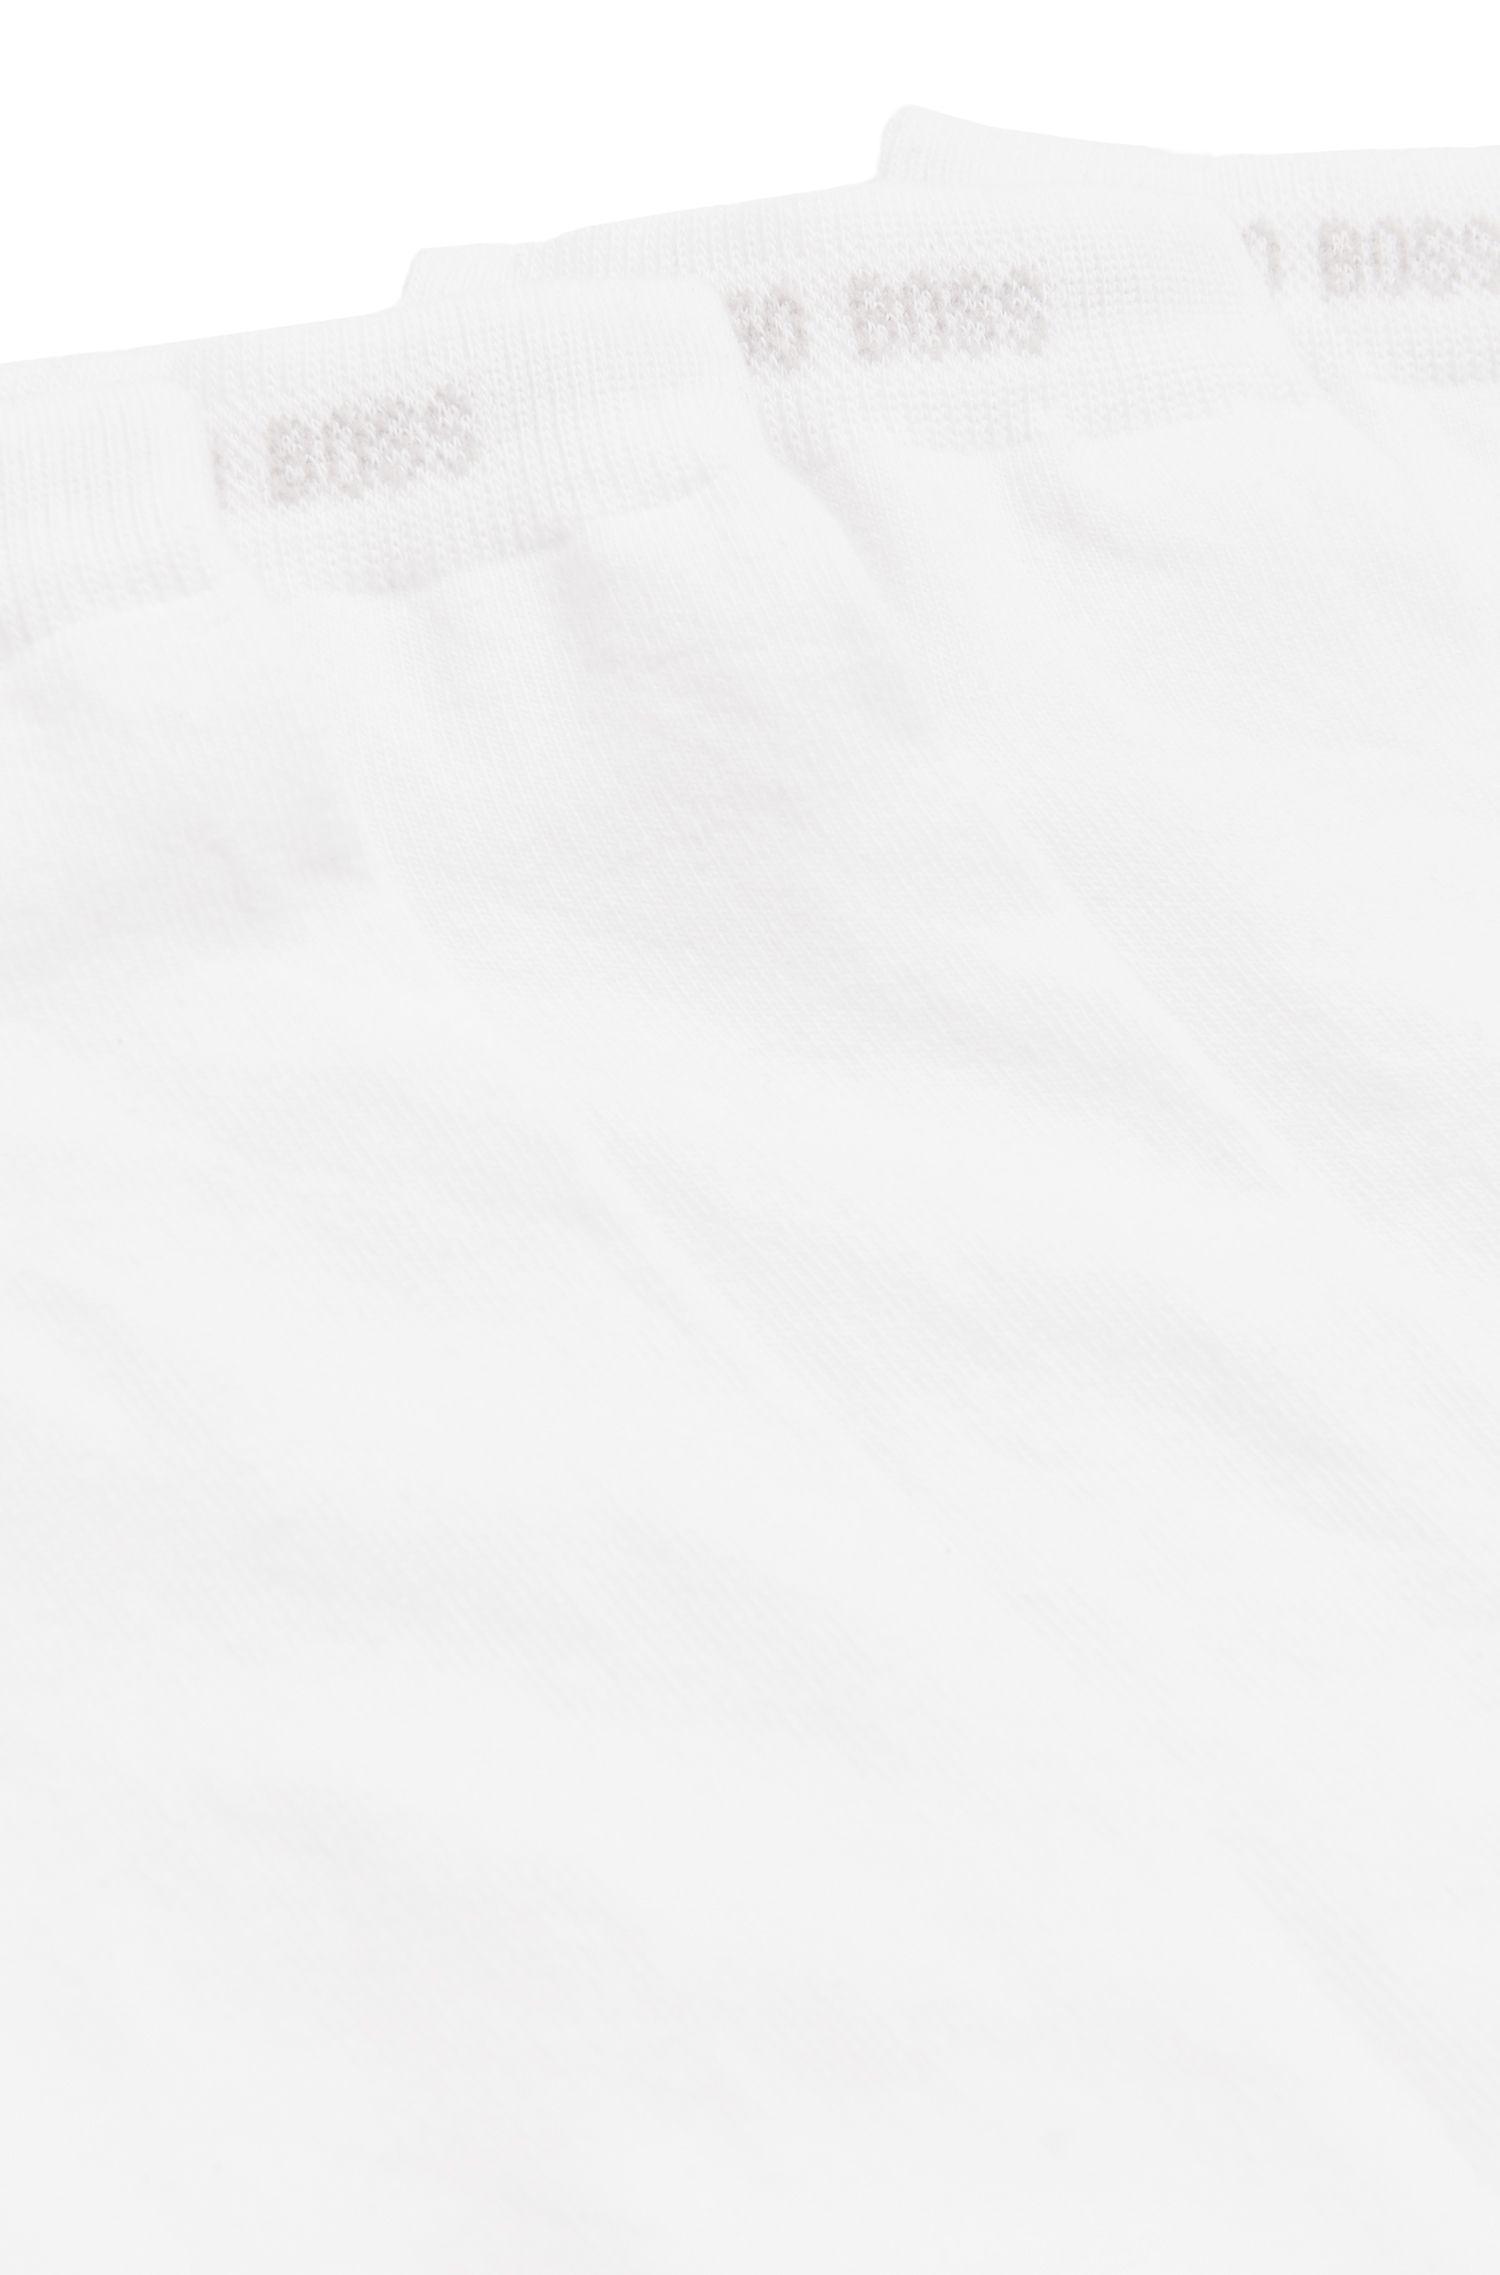 Doppelpack Sneaker-Socken aus elastischem Baumwoll-Mix: ´Twopack Sneaker`